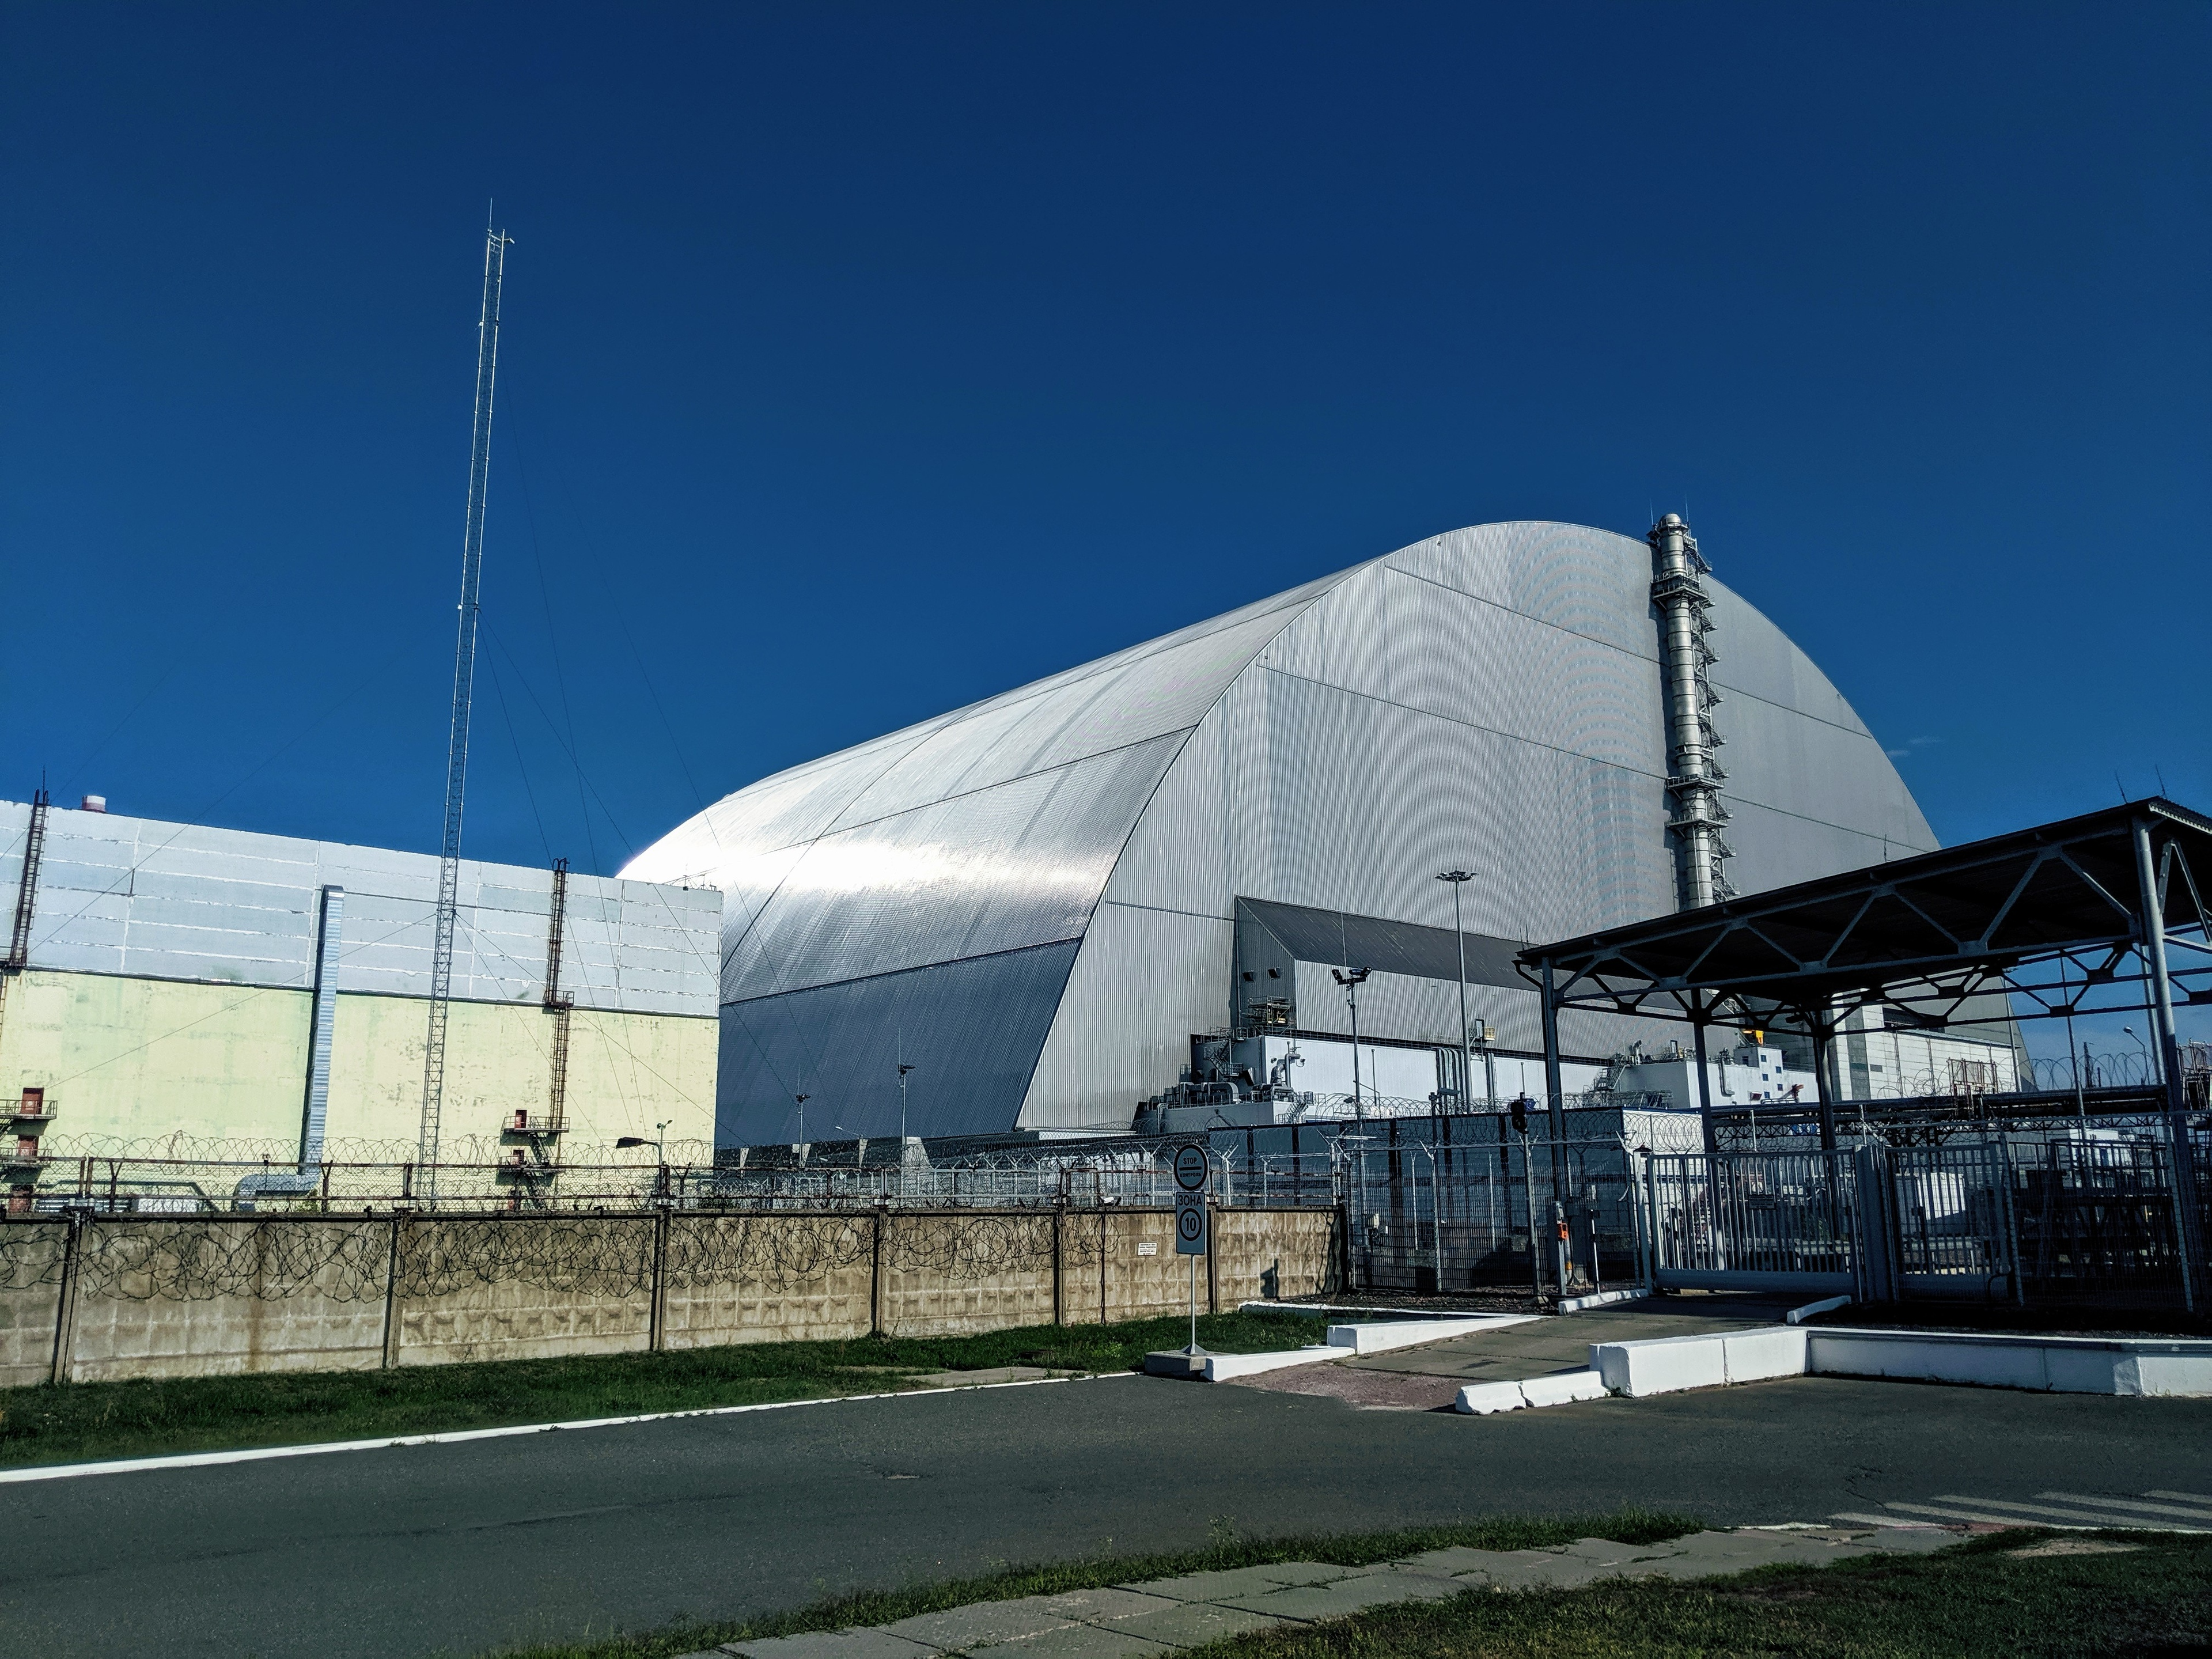 Chernobyl trip - reactor #3